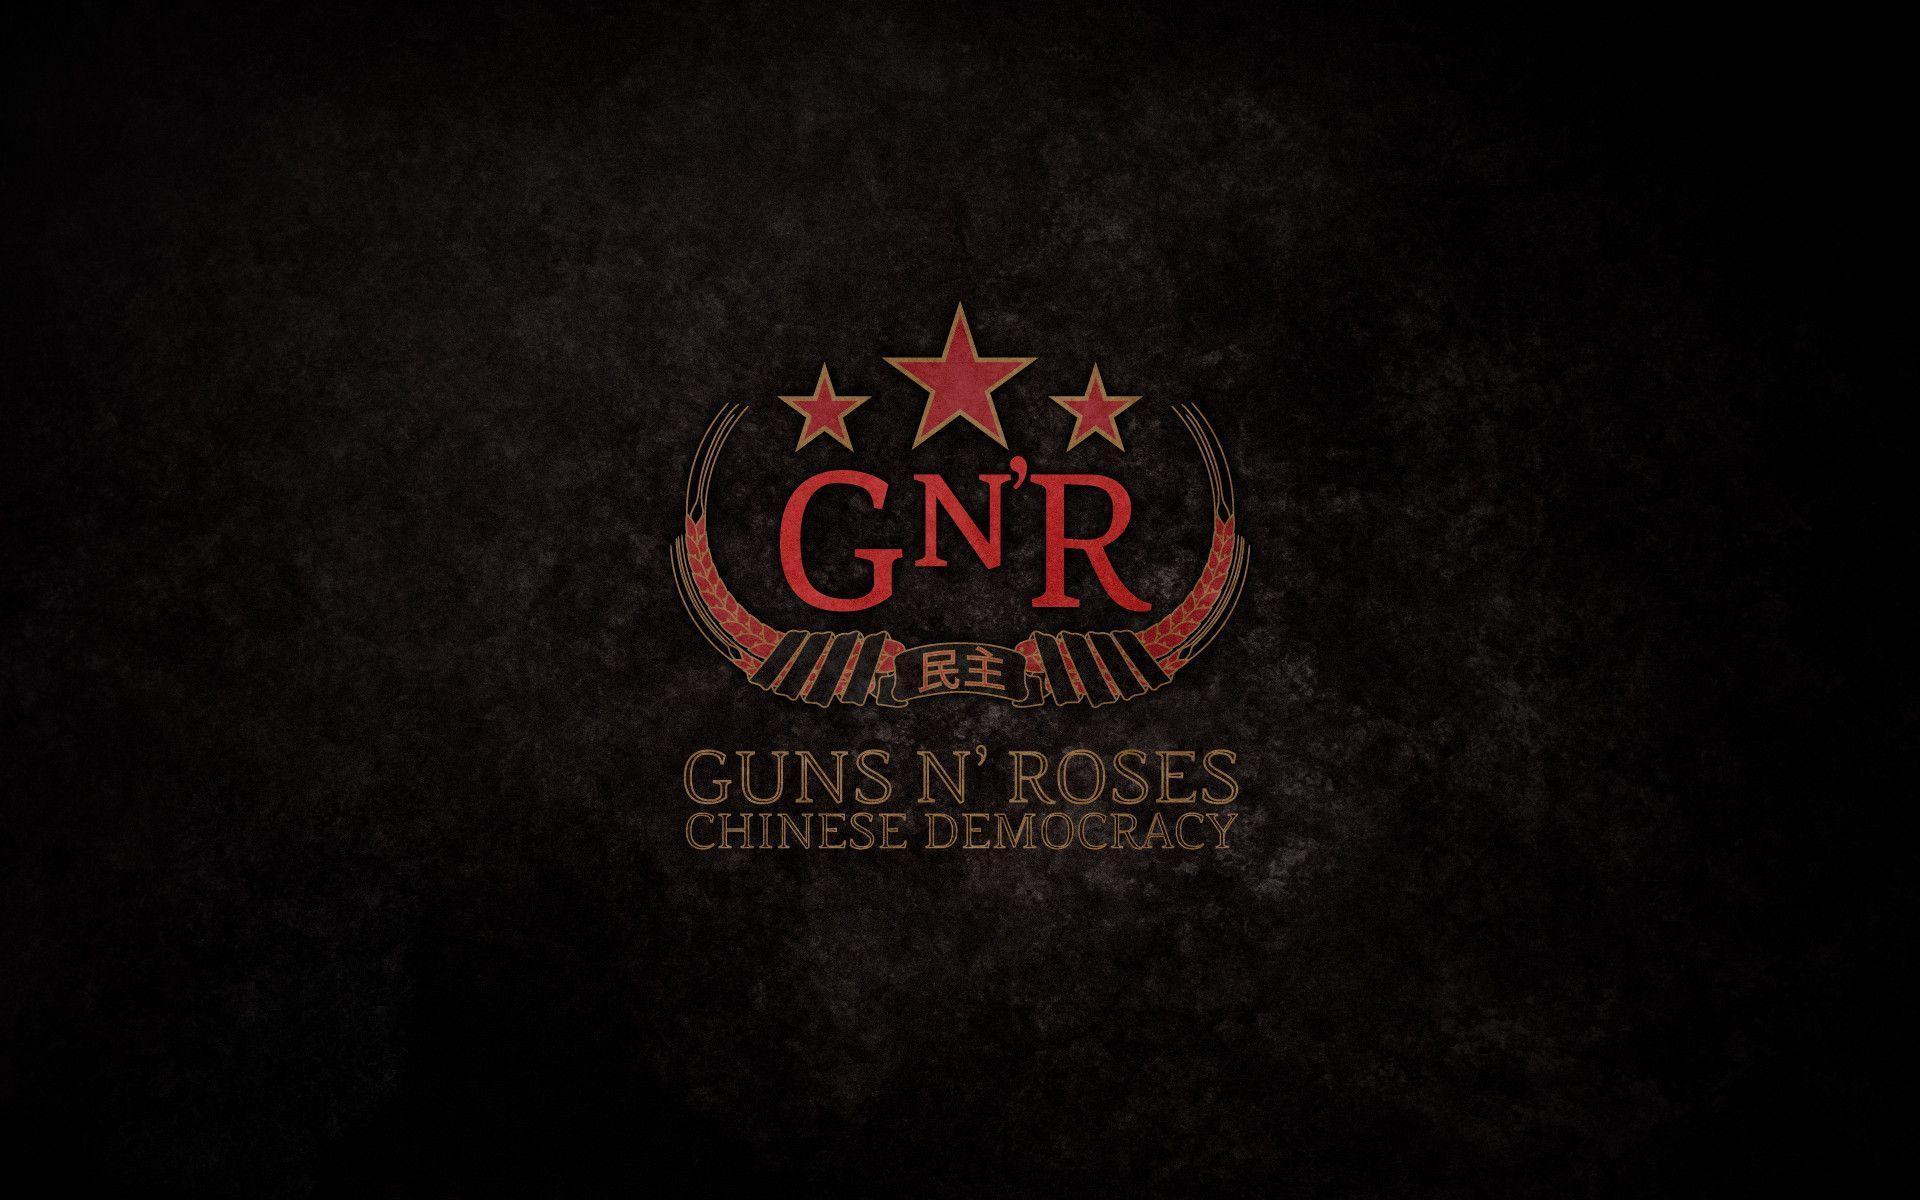 Guns N Roses Logo Wallpapers 1920x1200